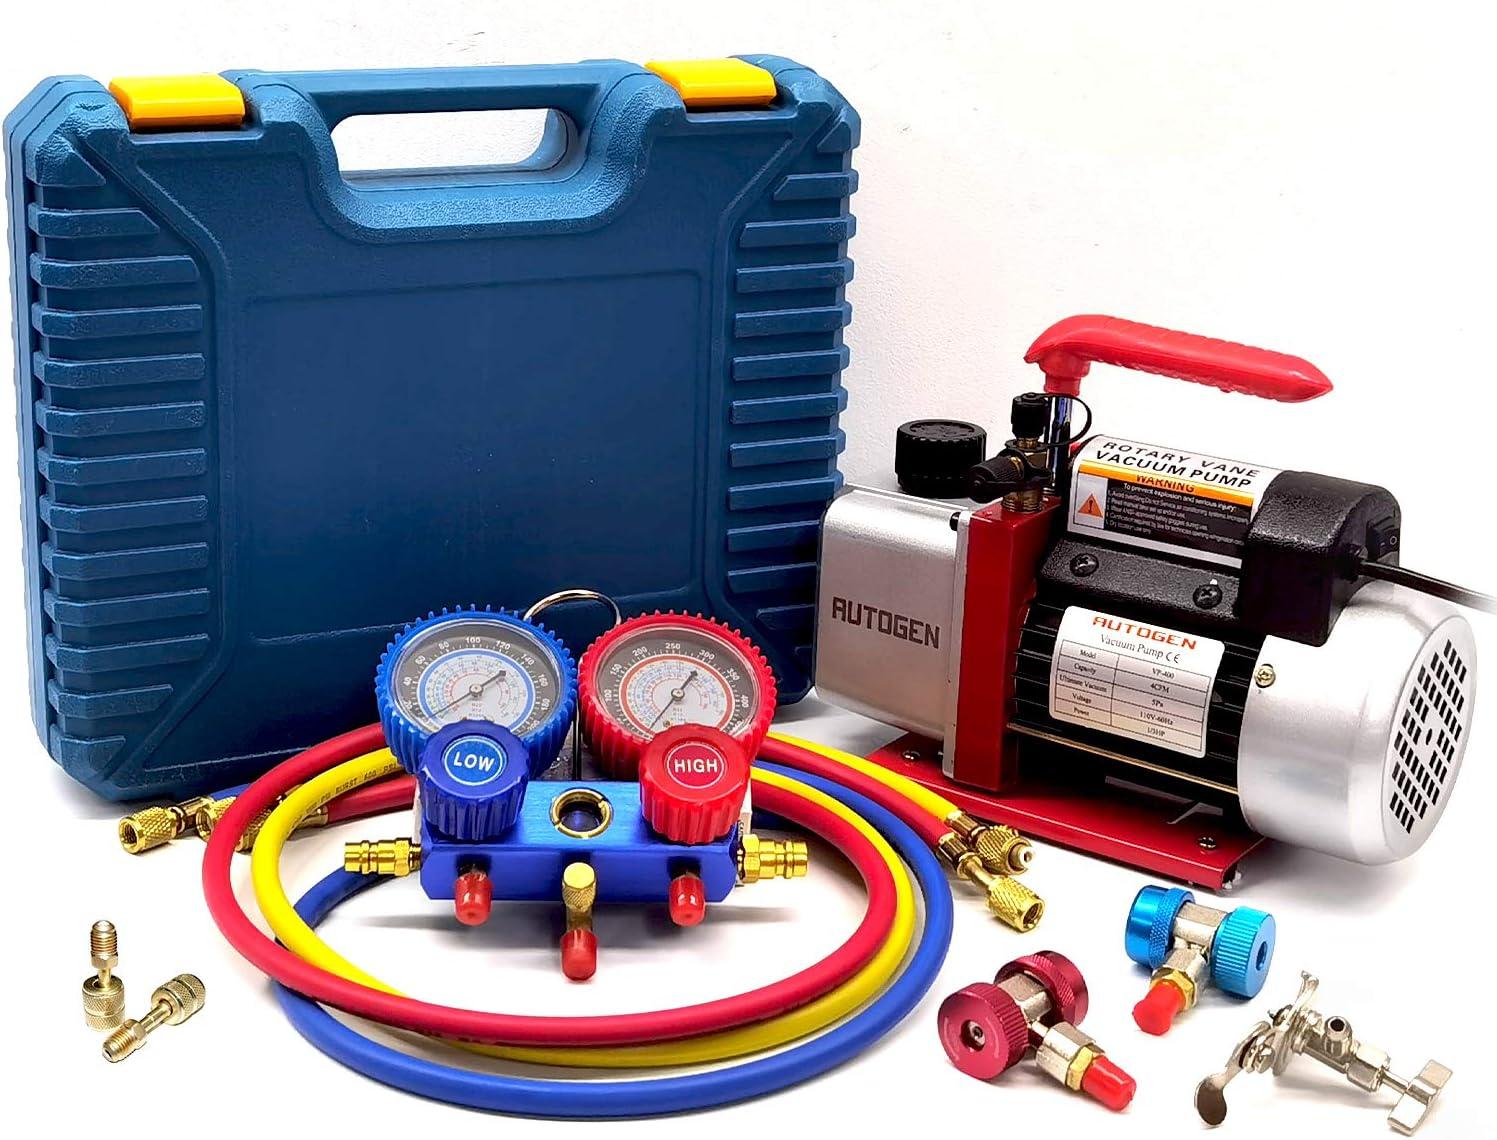 AUTOGEN 4CFM Single-Stage Air Vacuum Pump for HVAC/Auto AC Refrigerant Recharging Manifold Gauge Set